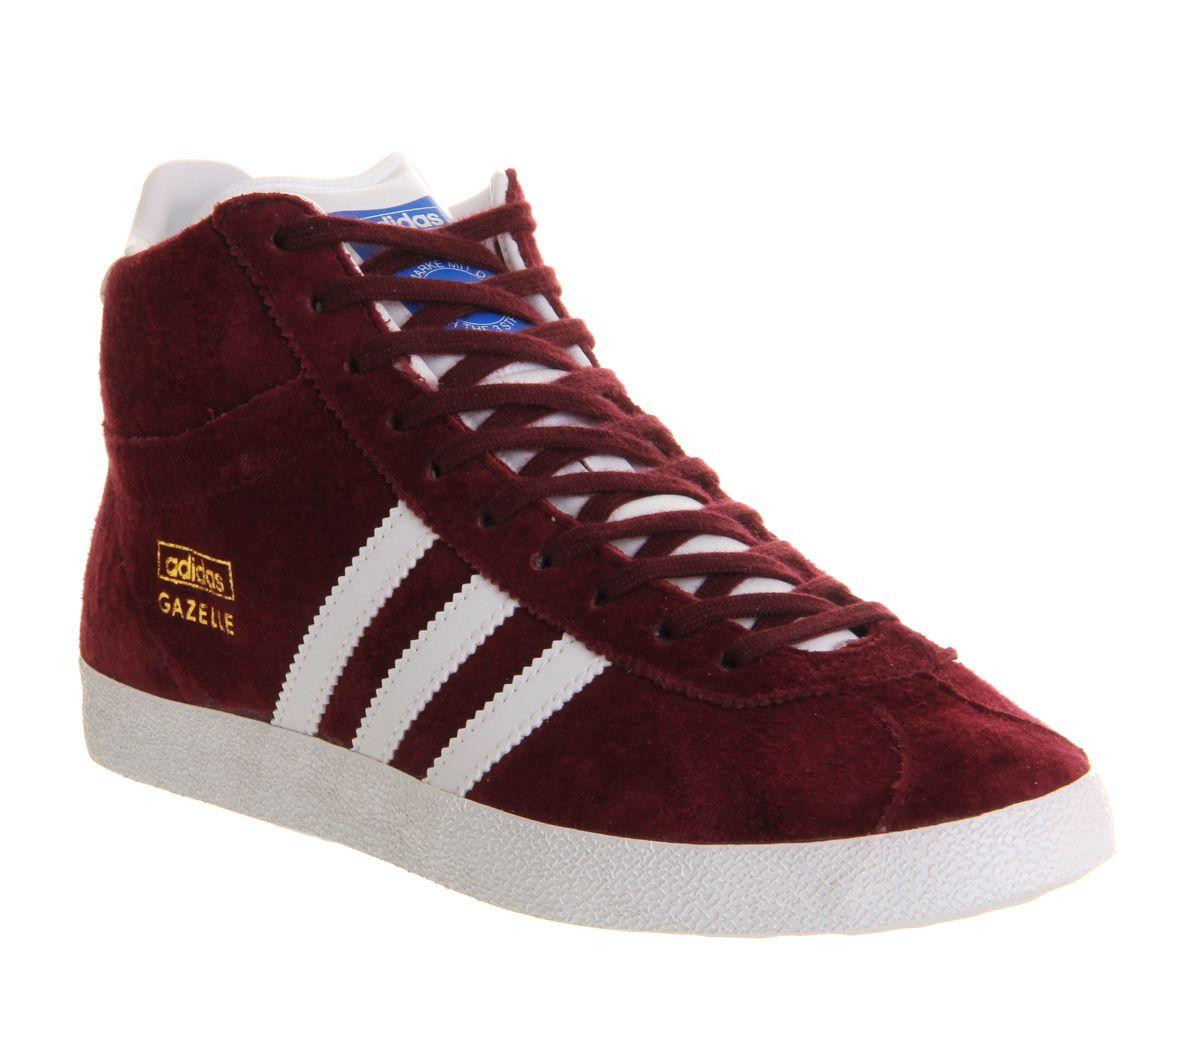 Adidas Gazelle Og Mid W Chaussures